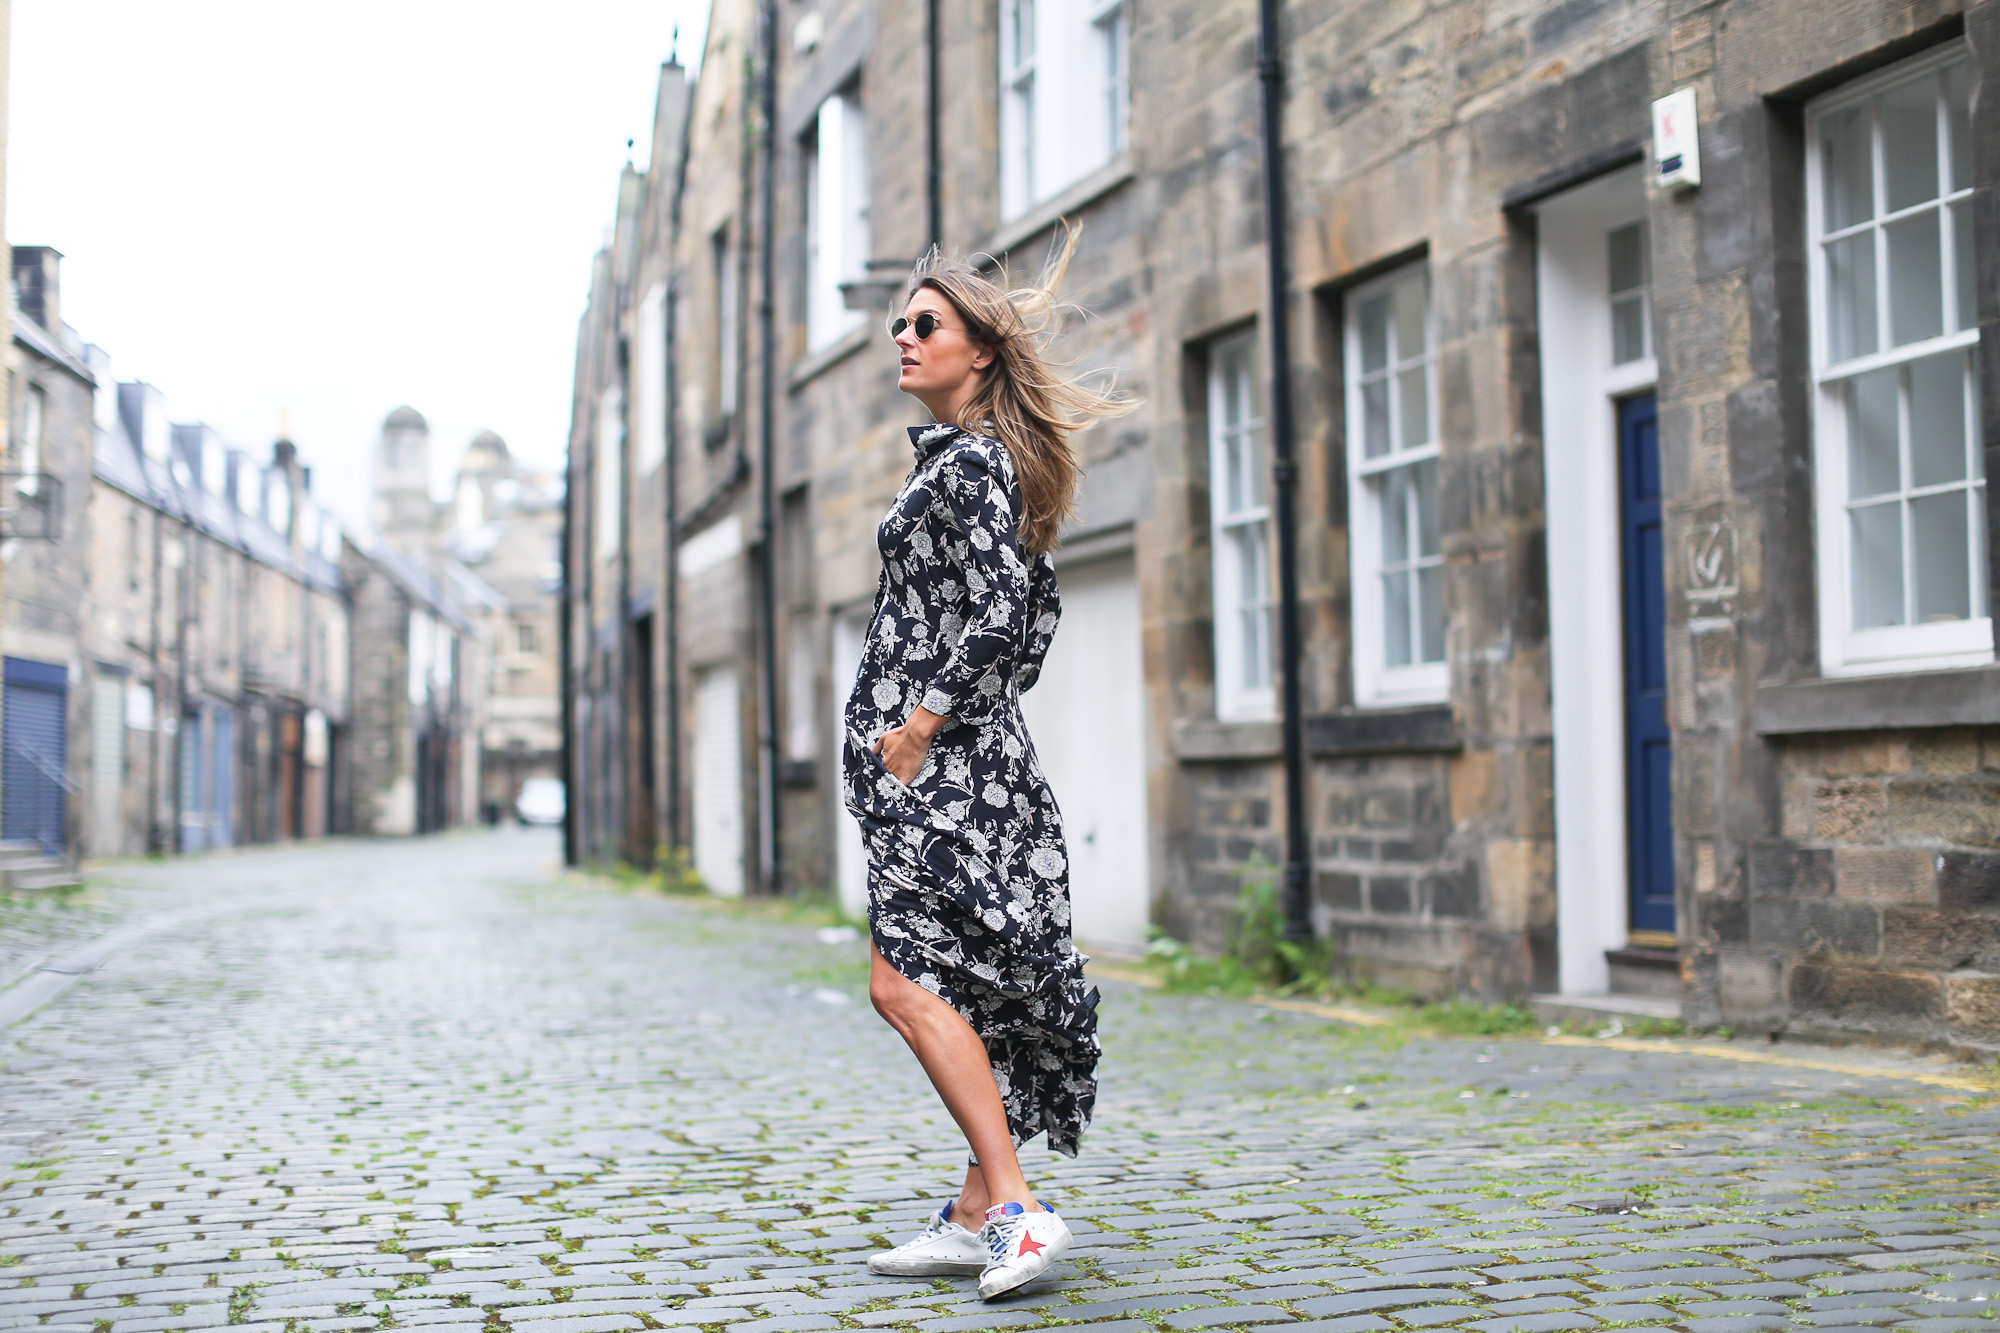 Clochet_streetstyle_edinburgh_igerswindtrip_escociamola_zaralongflowerprintdress_goldengoosedeluxe_sneakers-4